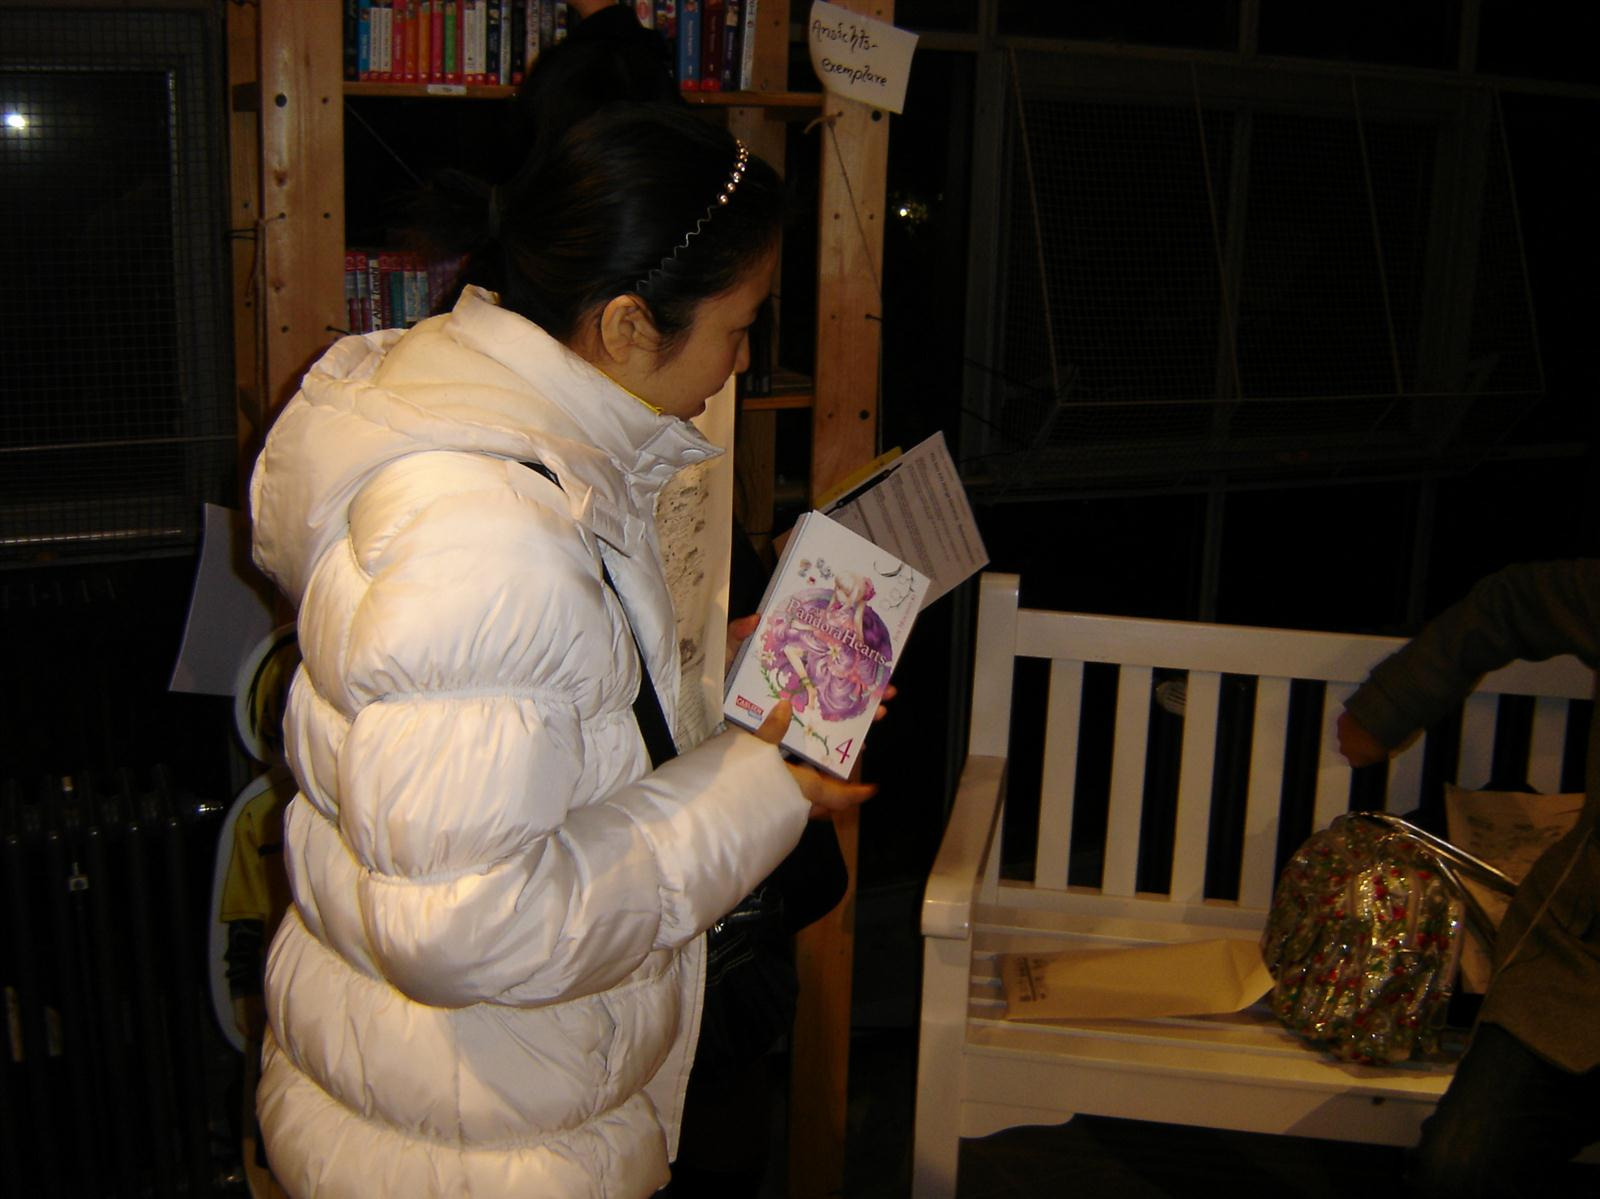 Japan_Week_2011_Wie.MAI.KAI_Leseecke_Palmengarten_wmk_006